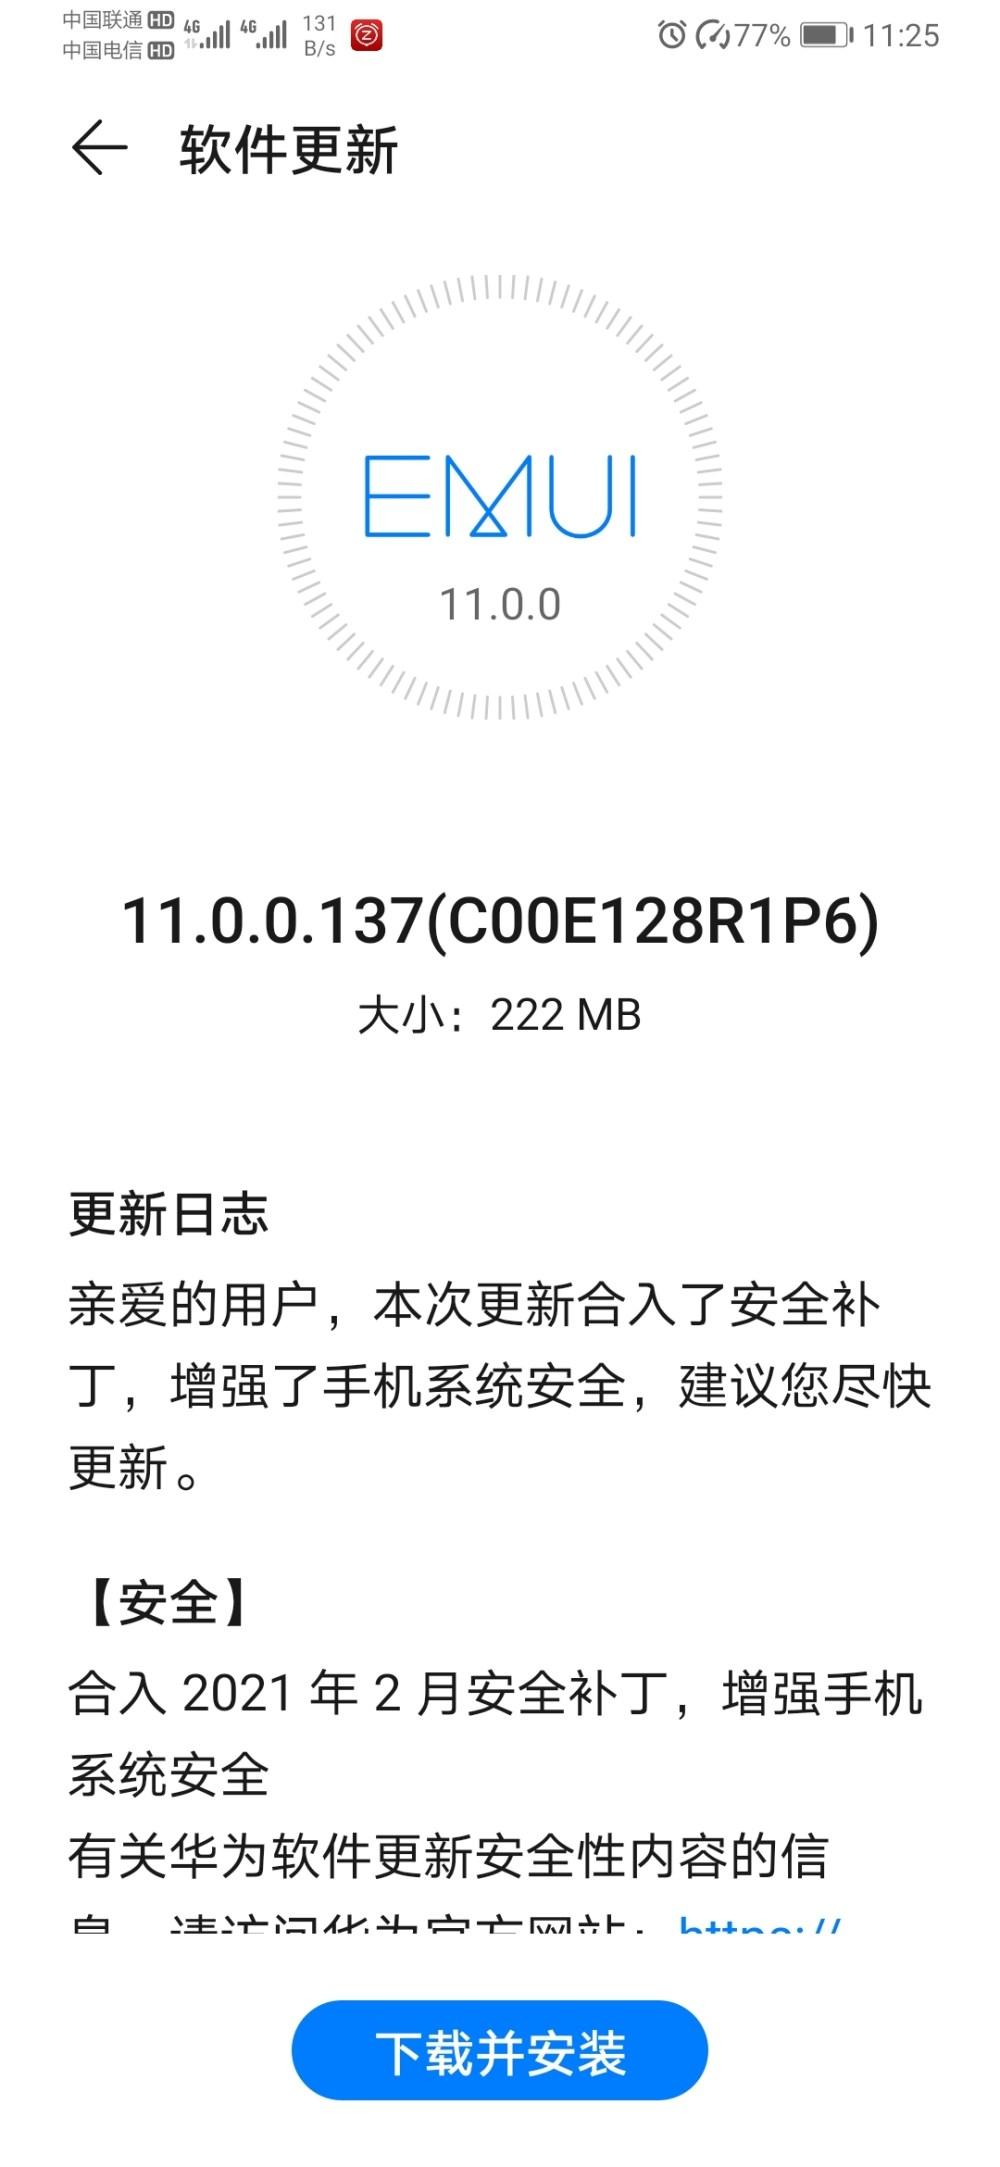 Huawei P30 Series EMUI 11.0.0.137